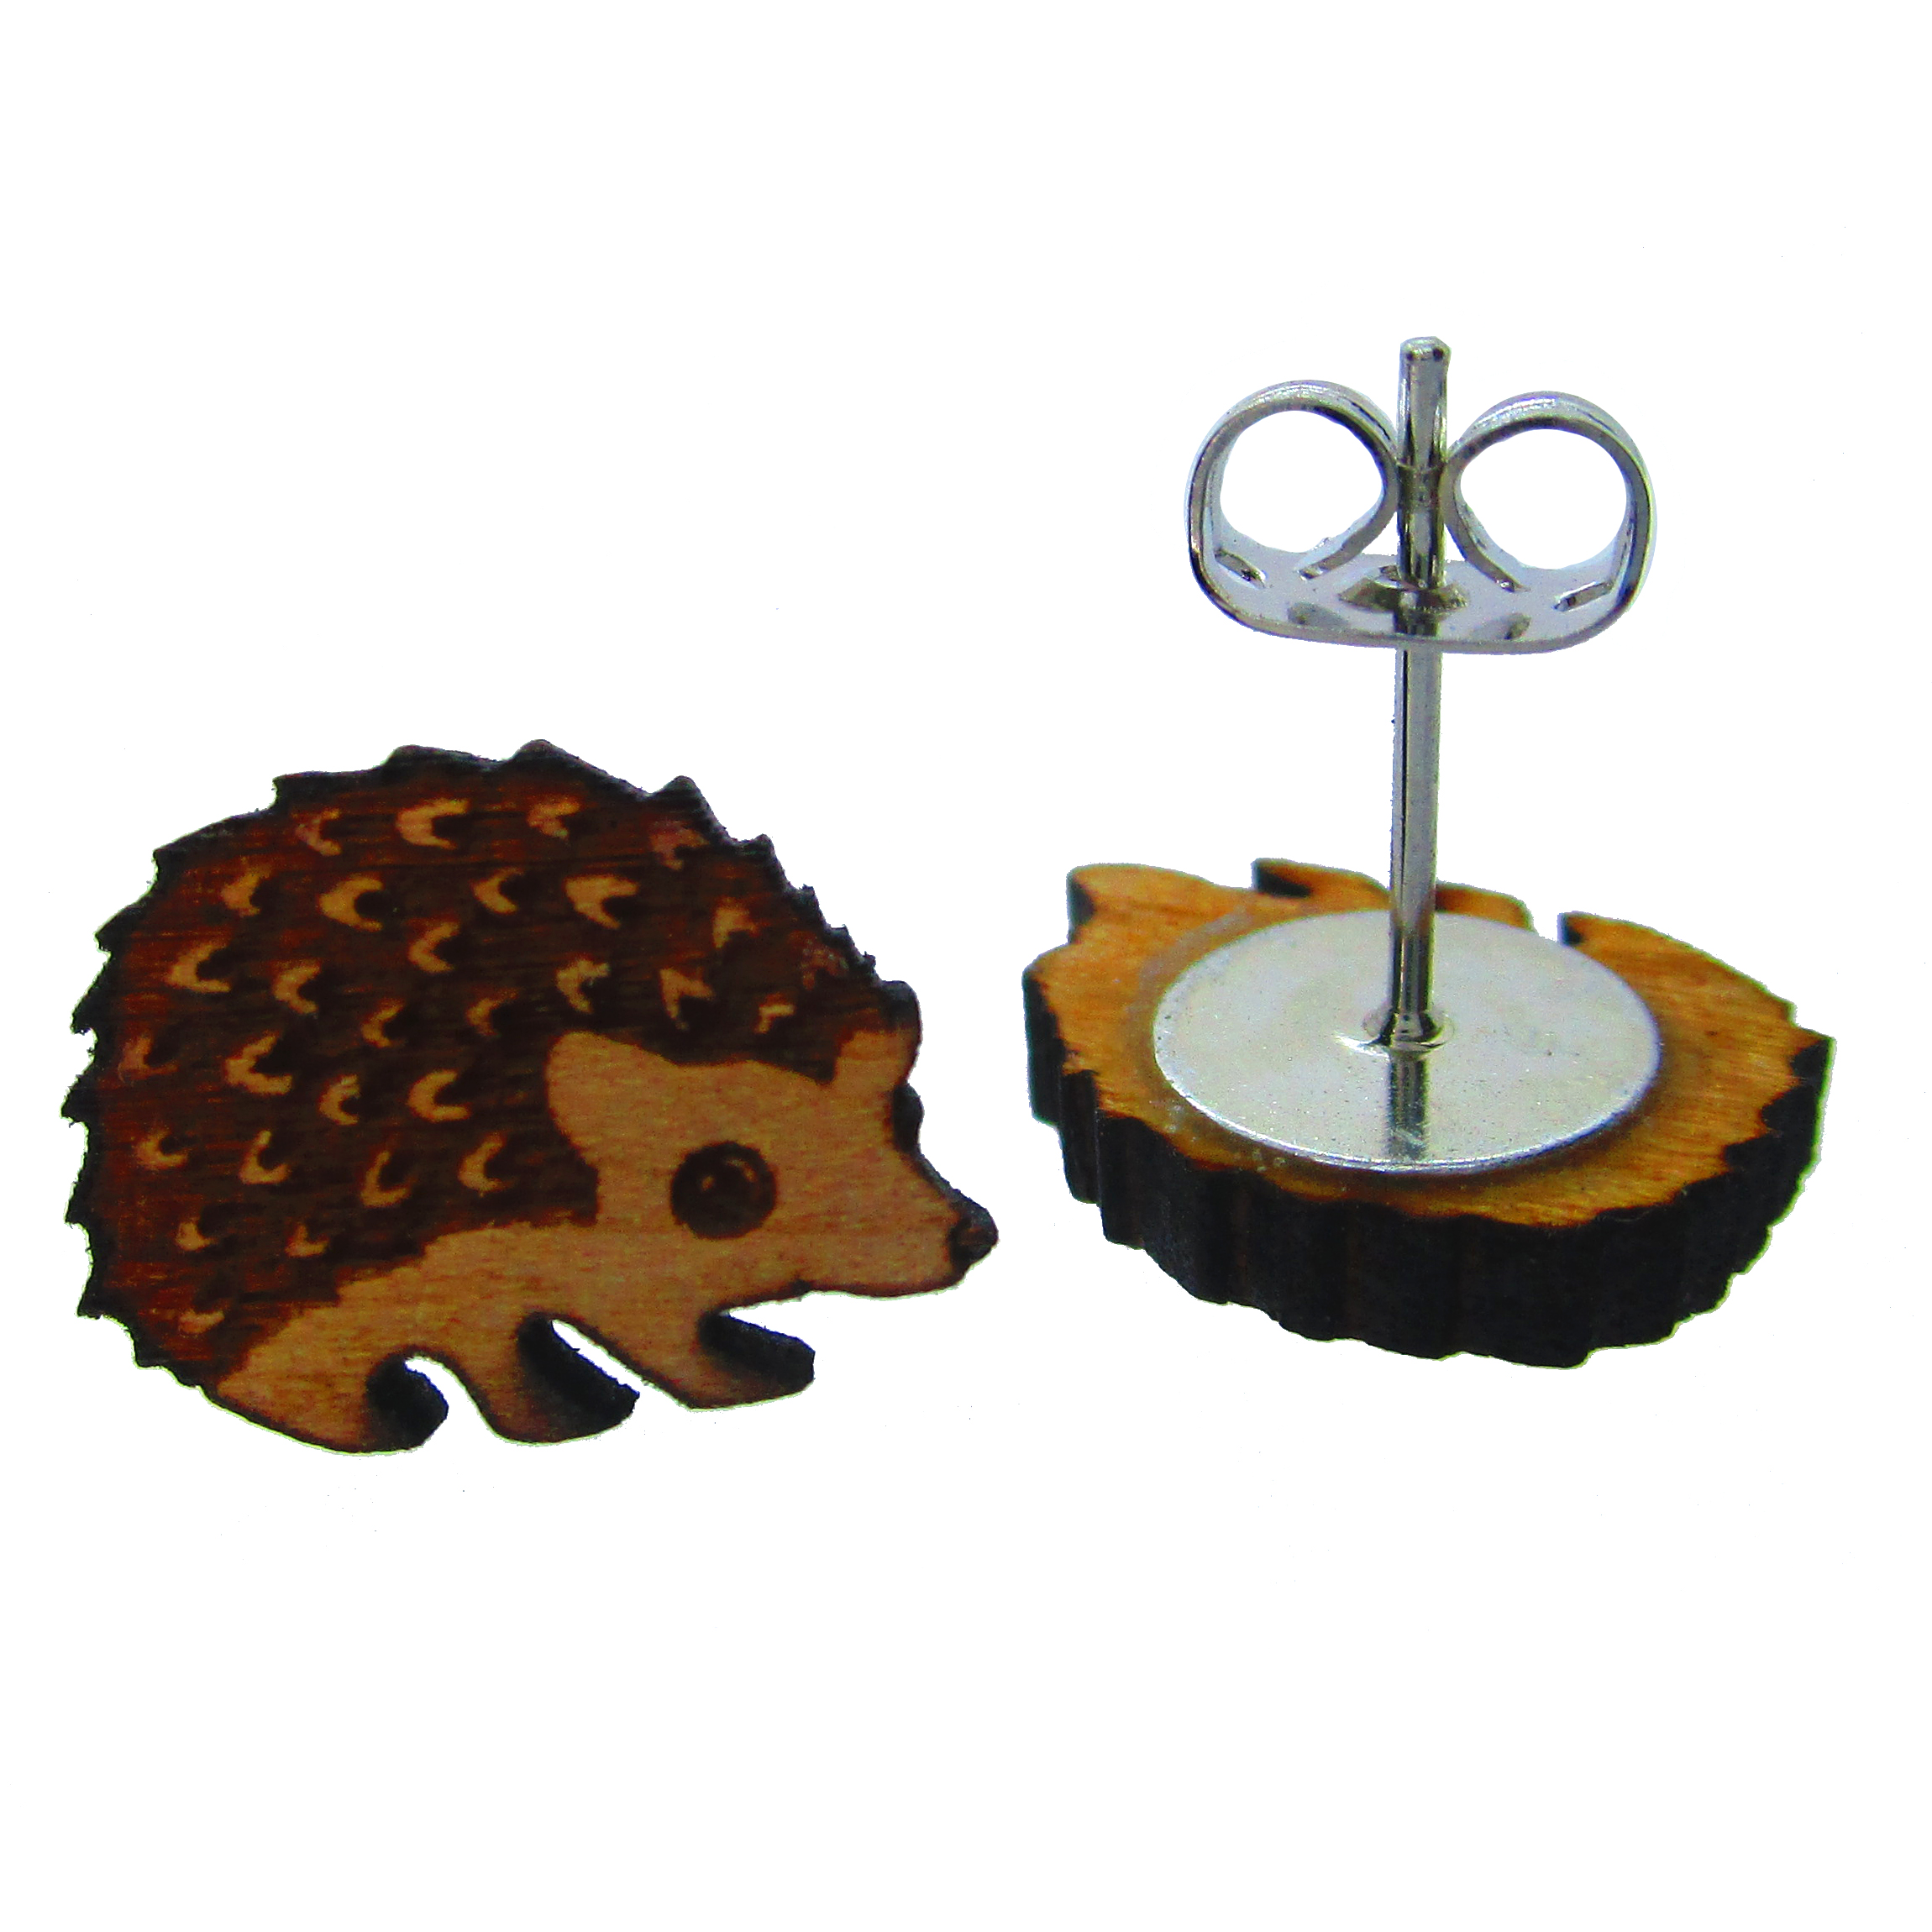 Cute Little Wood Hedgehog Stud Earrings ⋆ It S Just So You